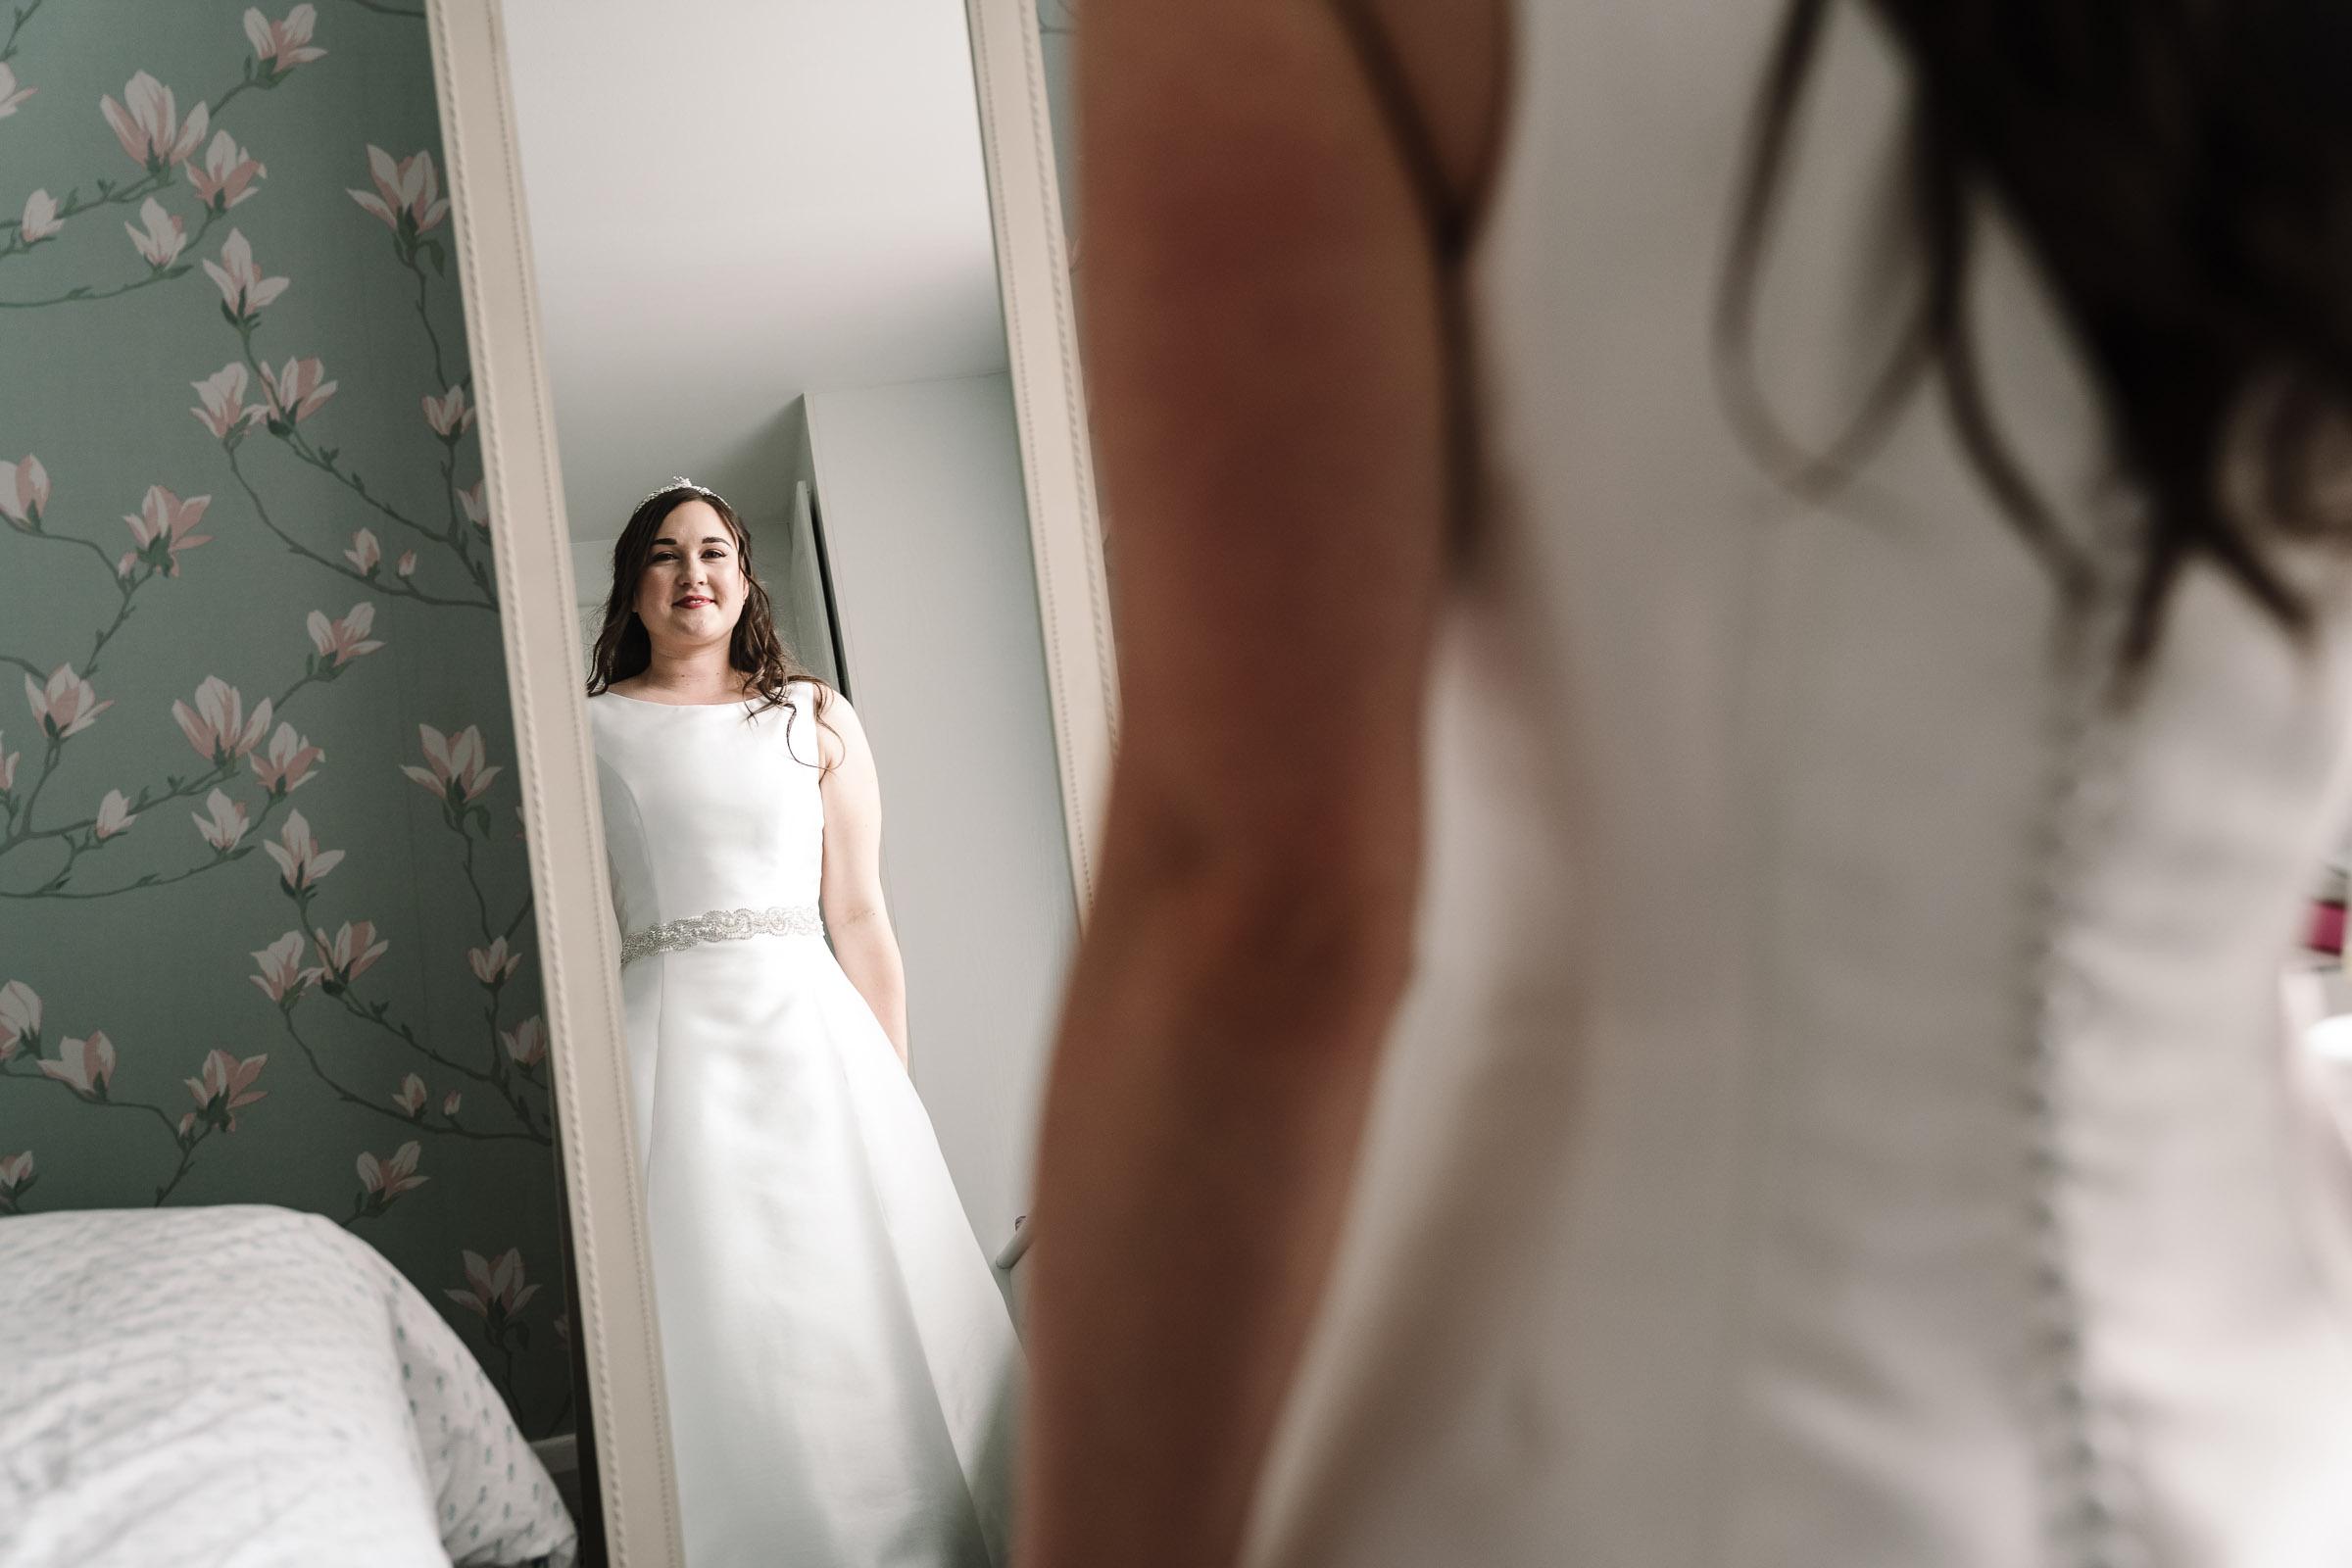 bride looking at herself in mirror in wedding dress